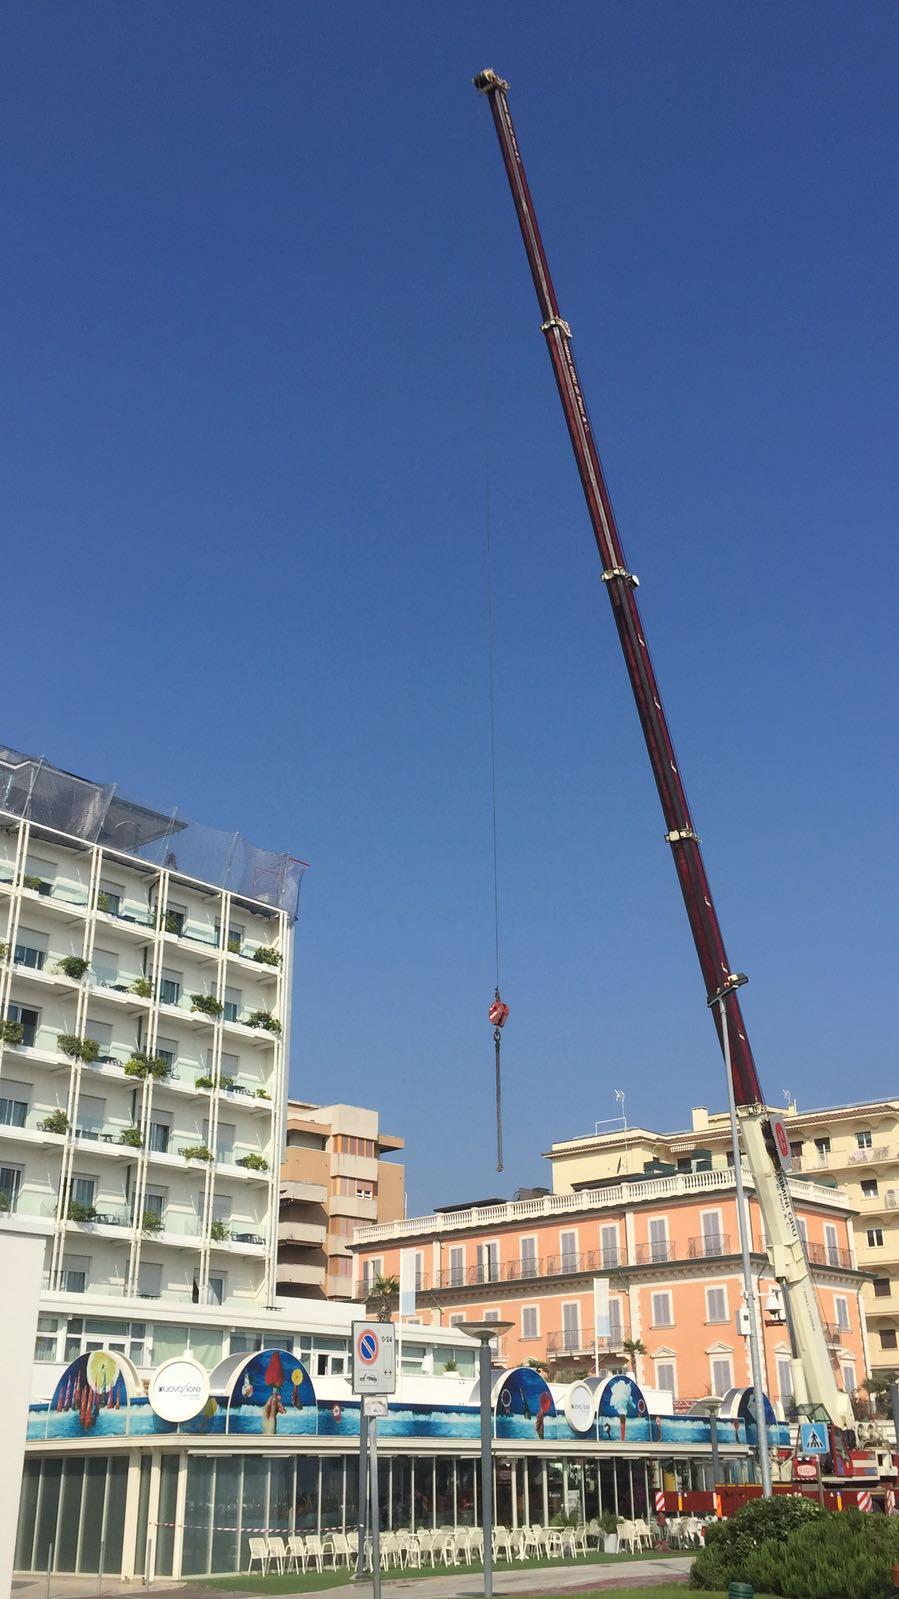 Autogru albergo Riccione